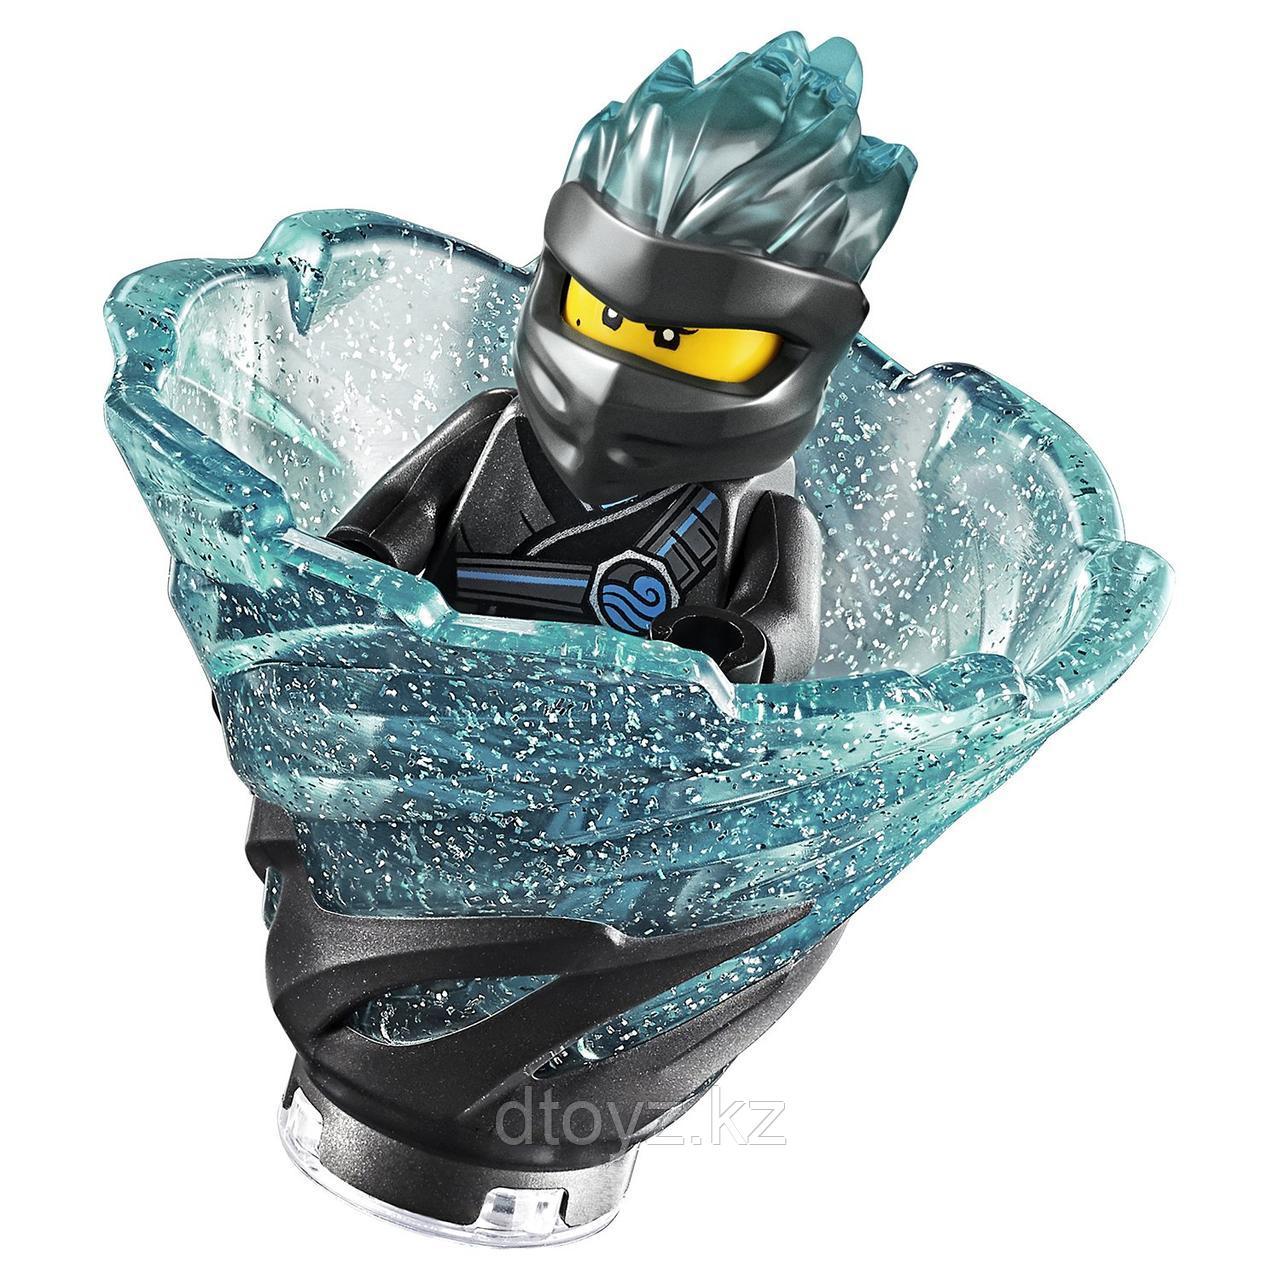 Lego Ninjago 70675 Внедорожник Катана 4x4, Лего Ниндзяго - фото 7